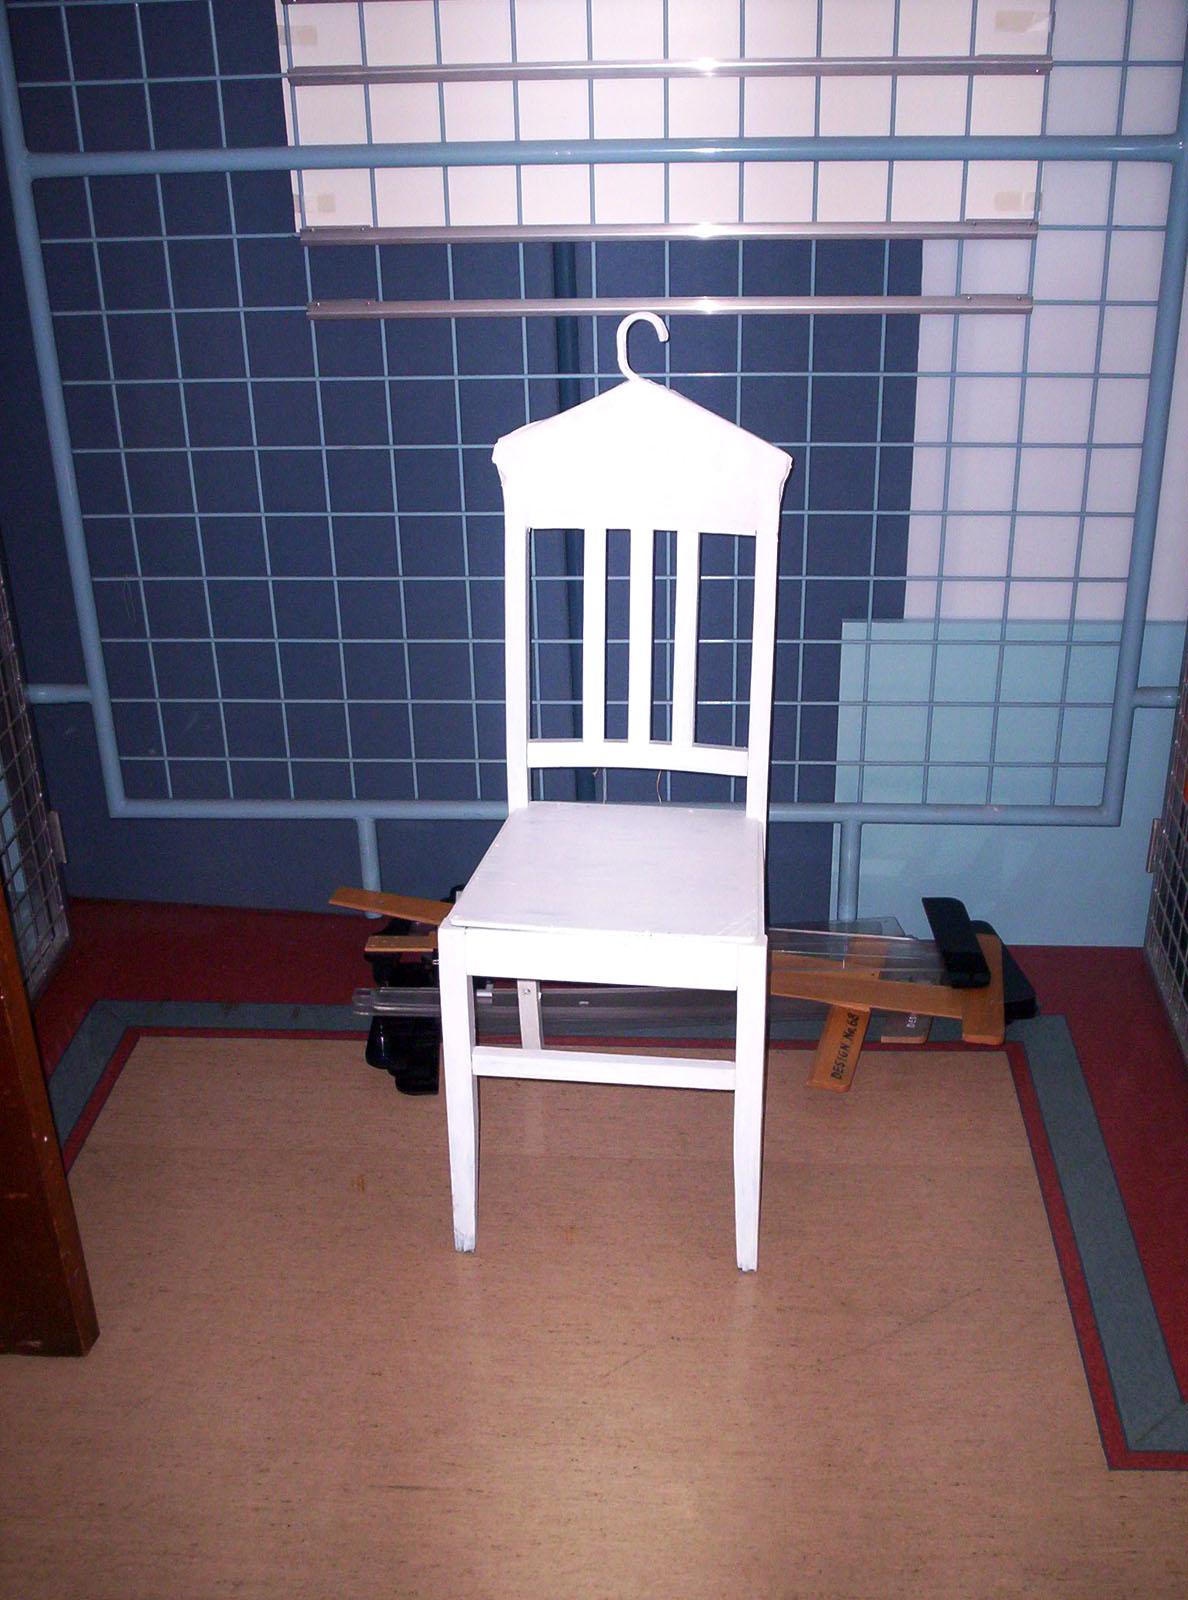 Multitasking chair photo